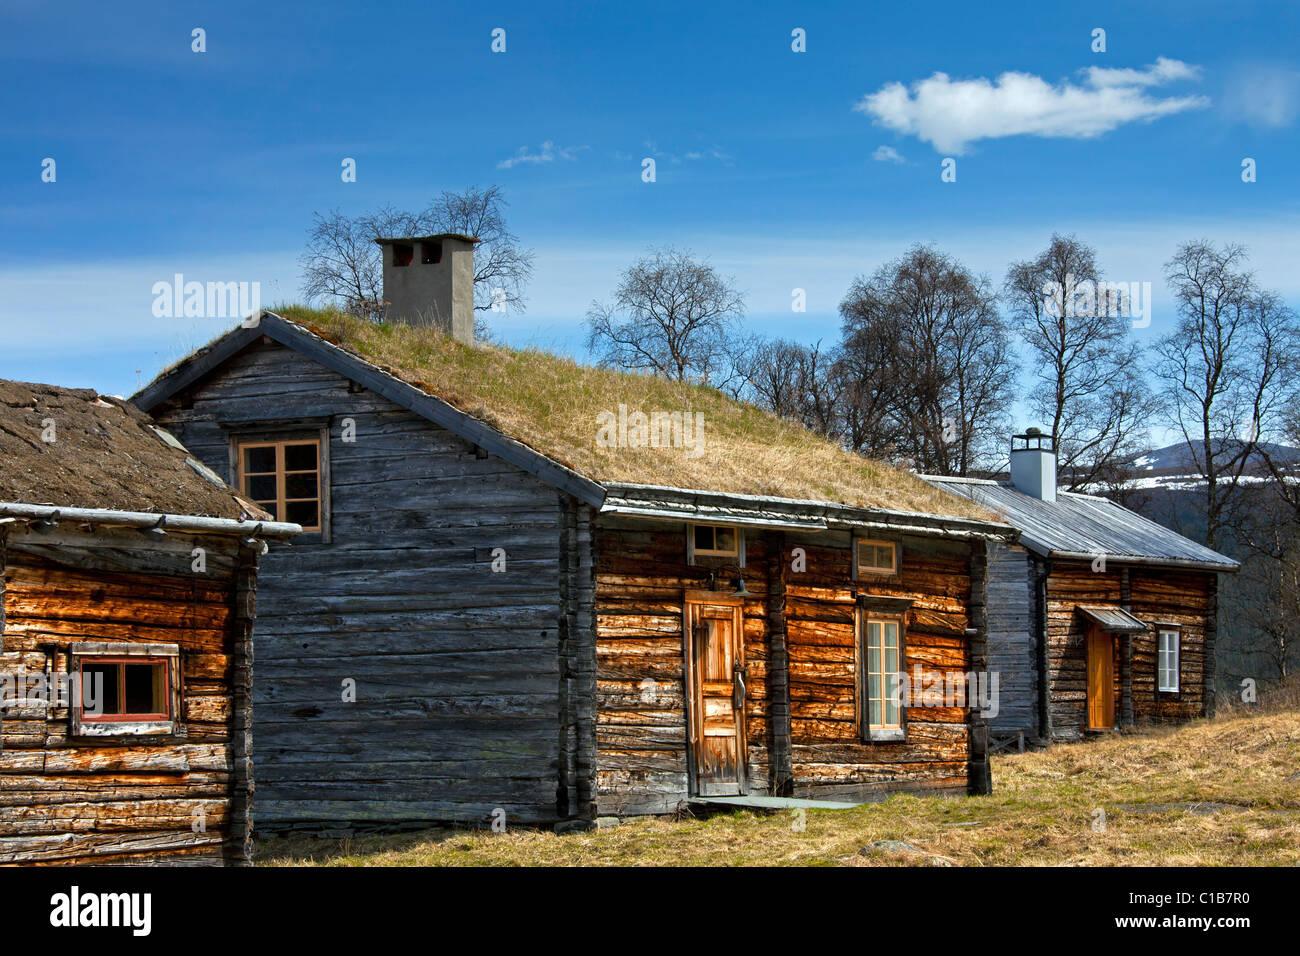 Log cabin with sod roof at Fatmomakke, Lapland, Sweden - Stock Image